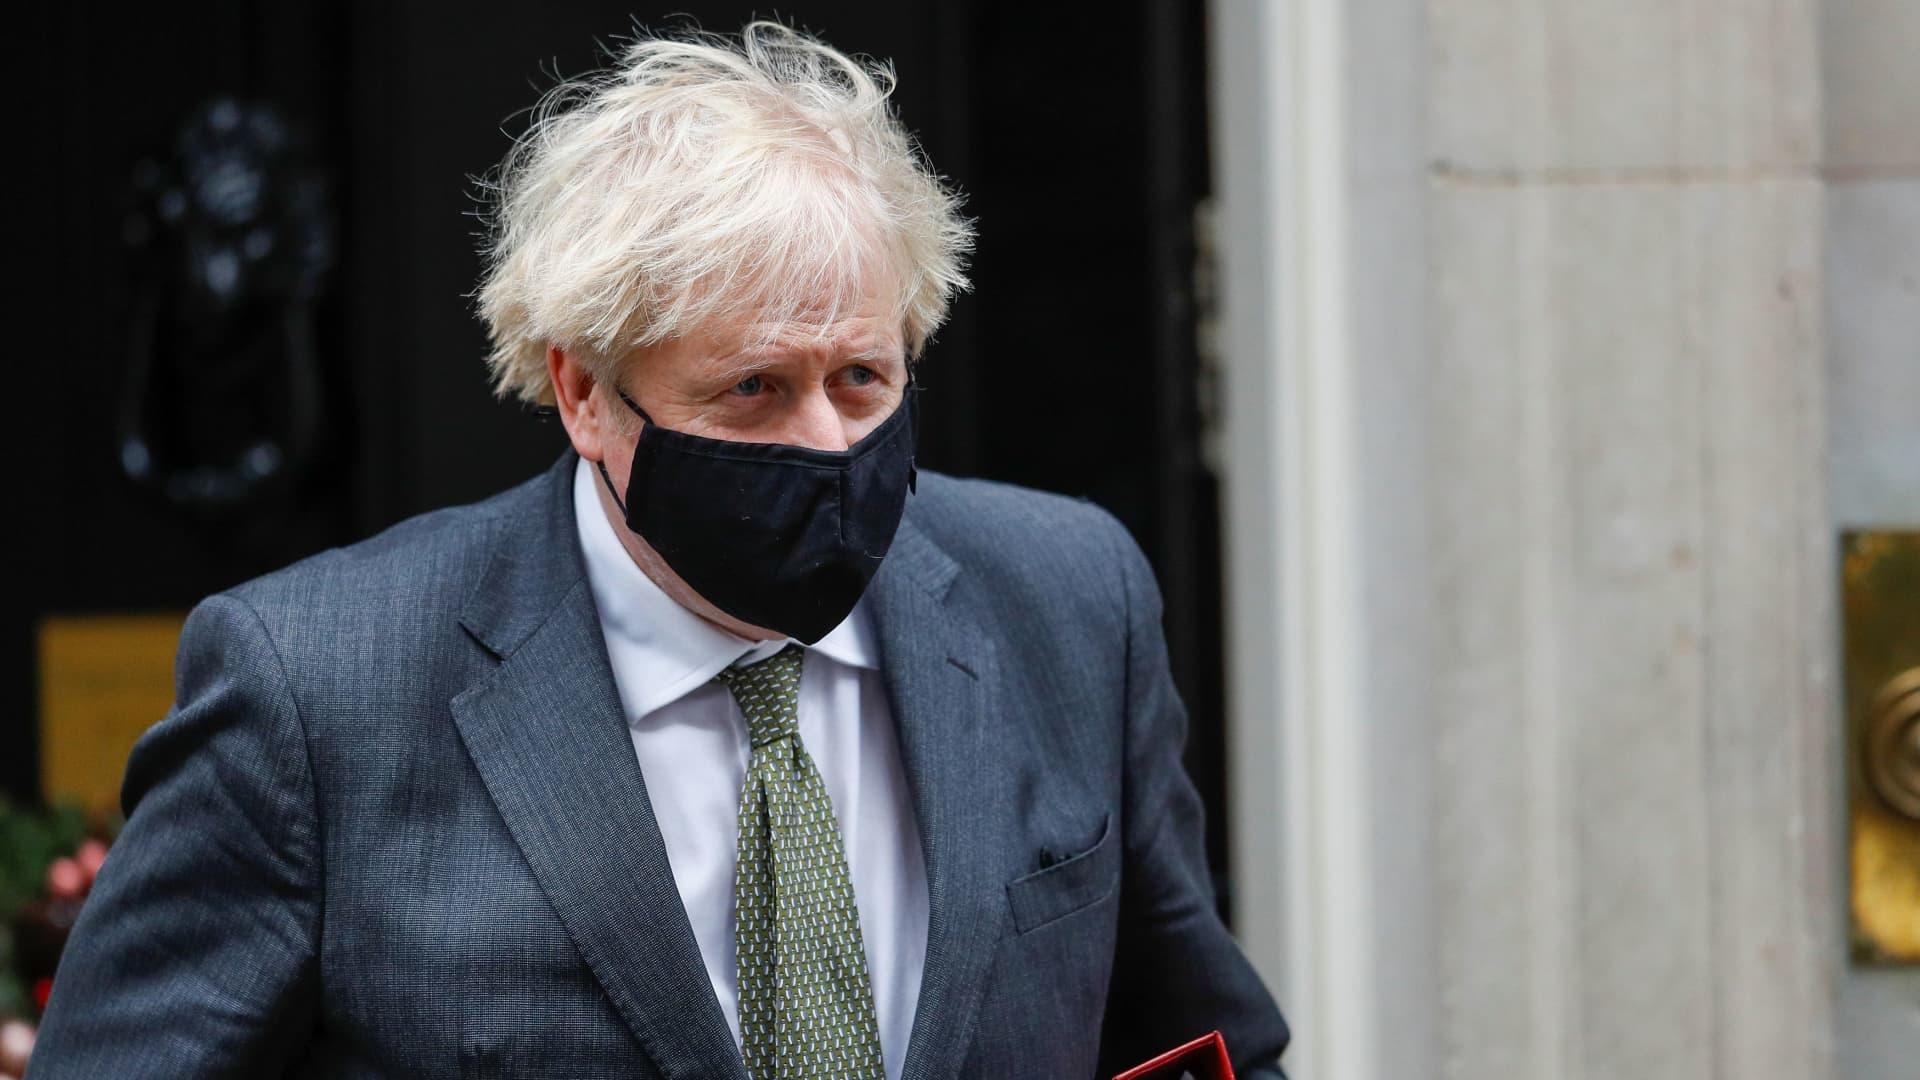 Britain's Prime Minister Boris Johnson leaves Downing Street in London, Britain December 9, 2020.